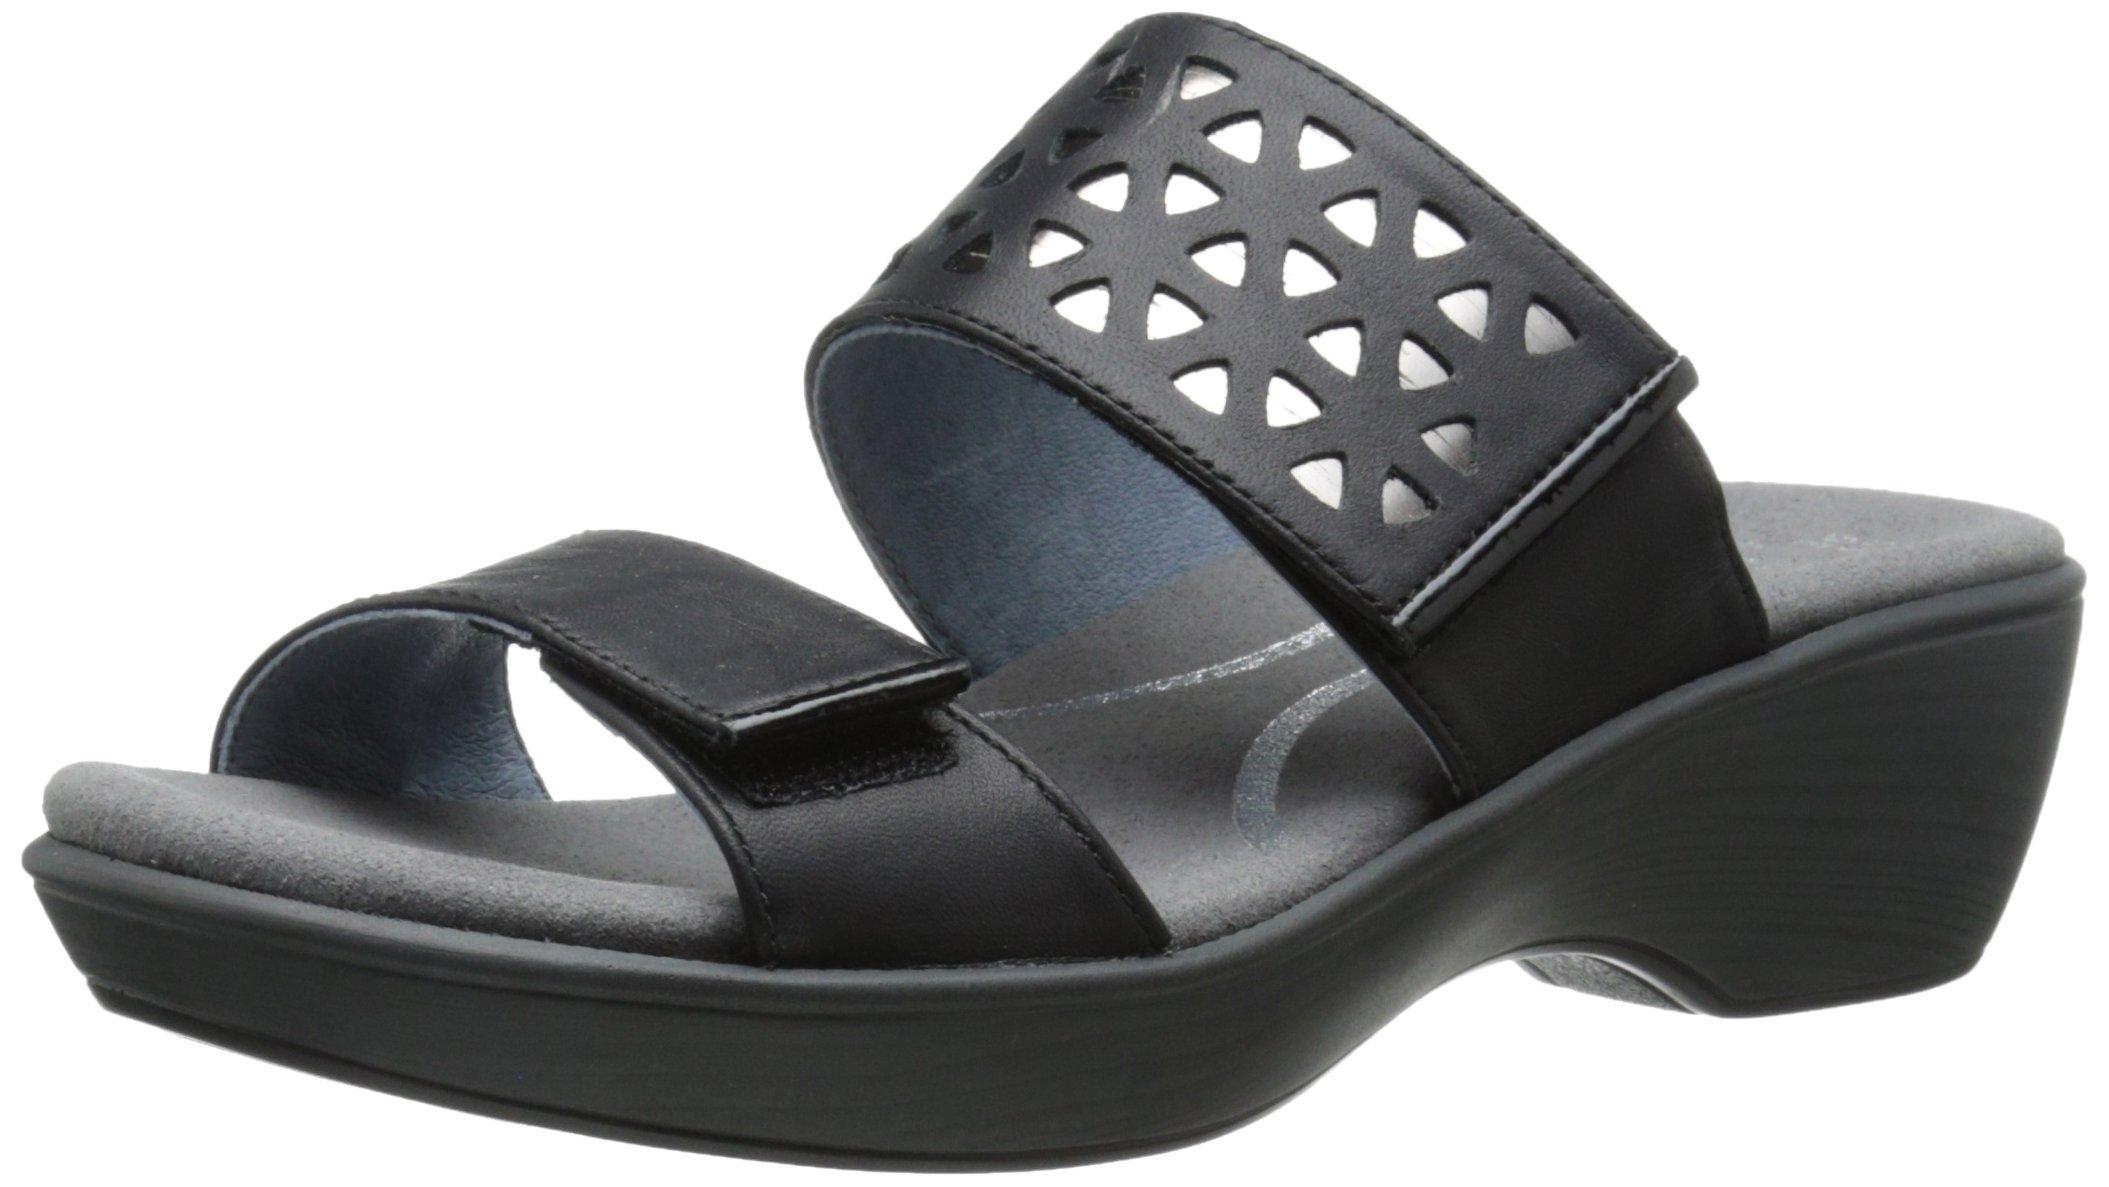 Naot Women's Moreto Wedge Sandal, Jet Black/Glass Silver/Black Patent, 39 EU/7.5-8 M US by NAOT